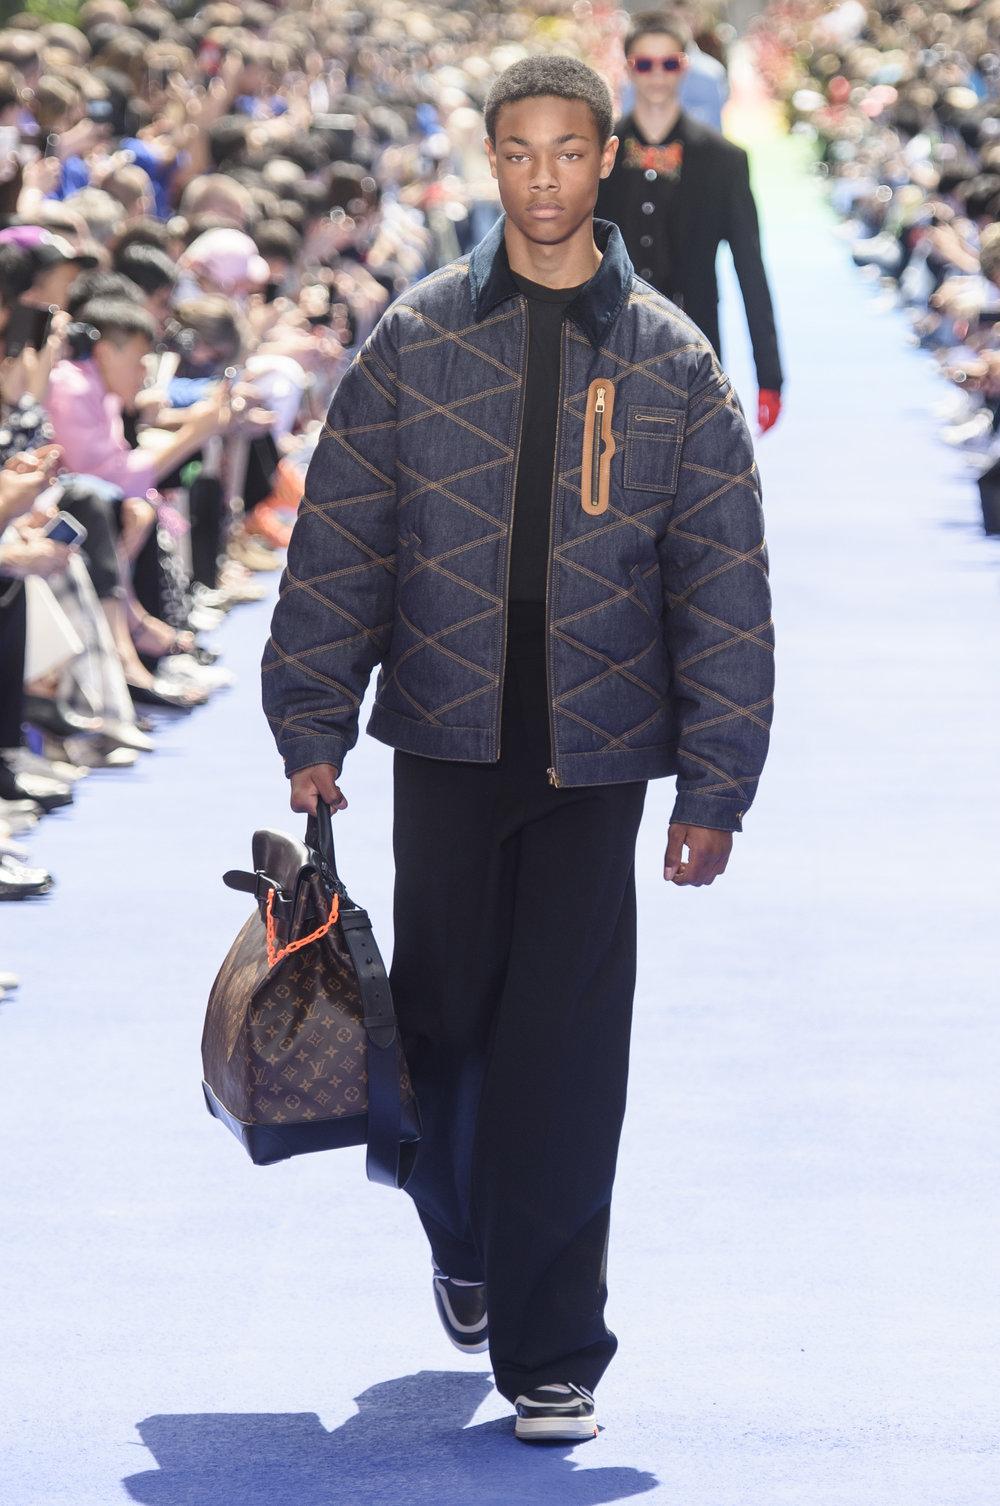 47_Louis_Vuitton_original_vui_prs_ss19_142.jpg